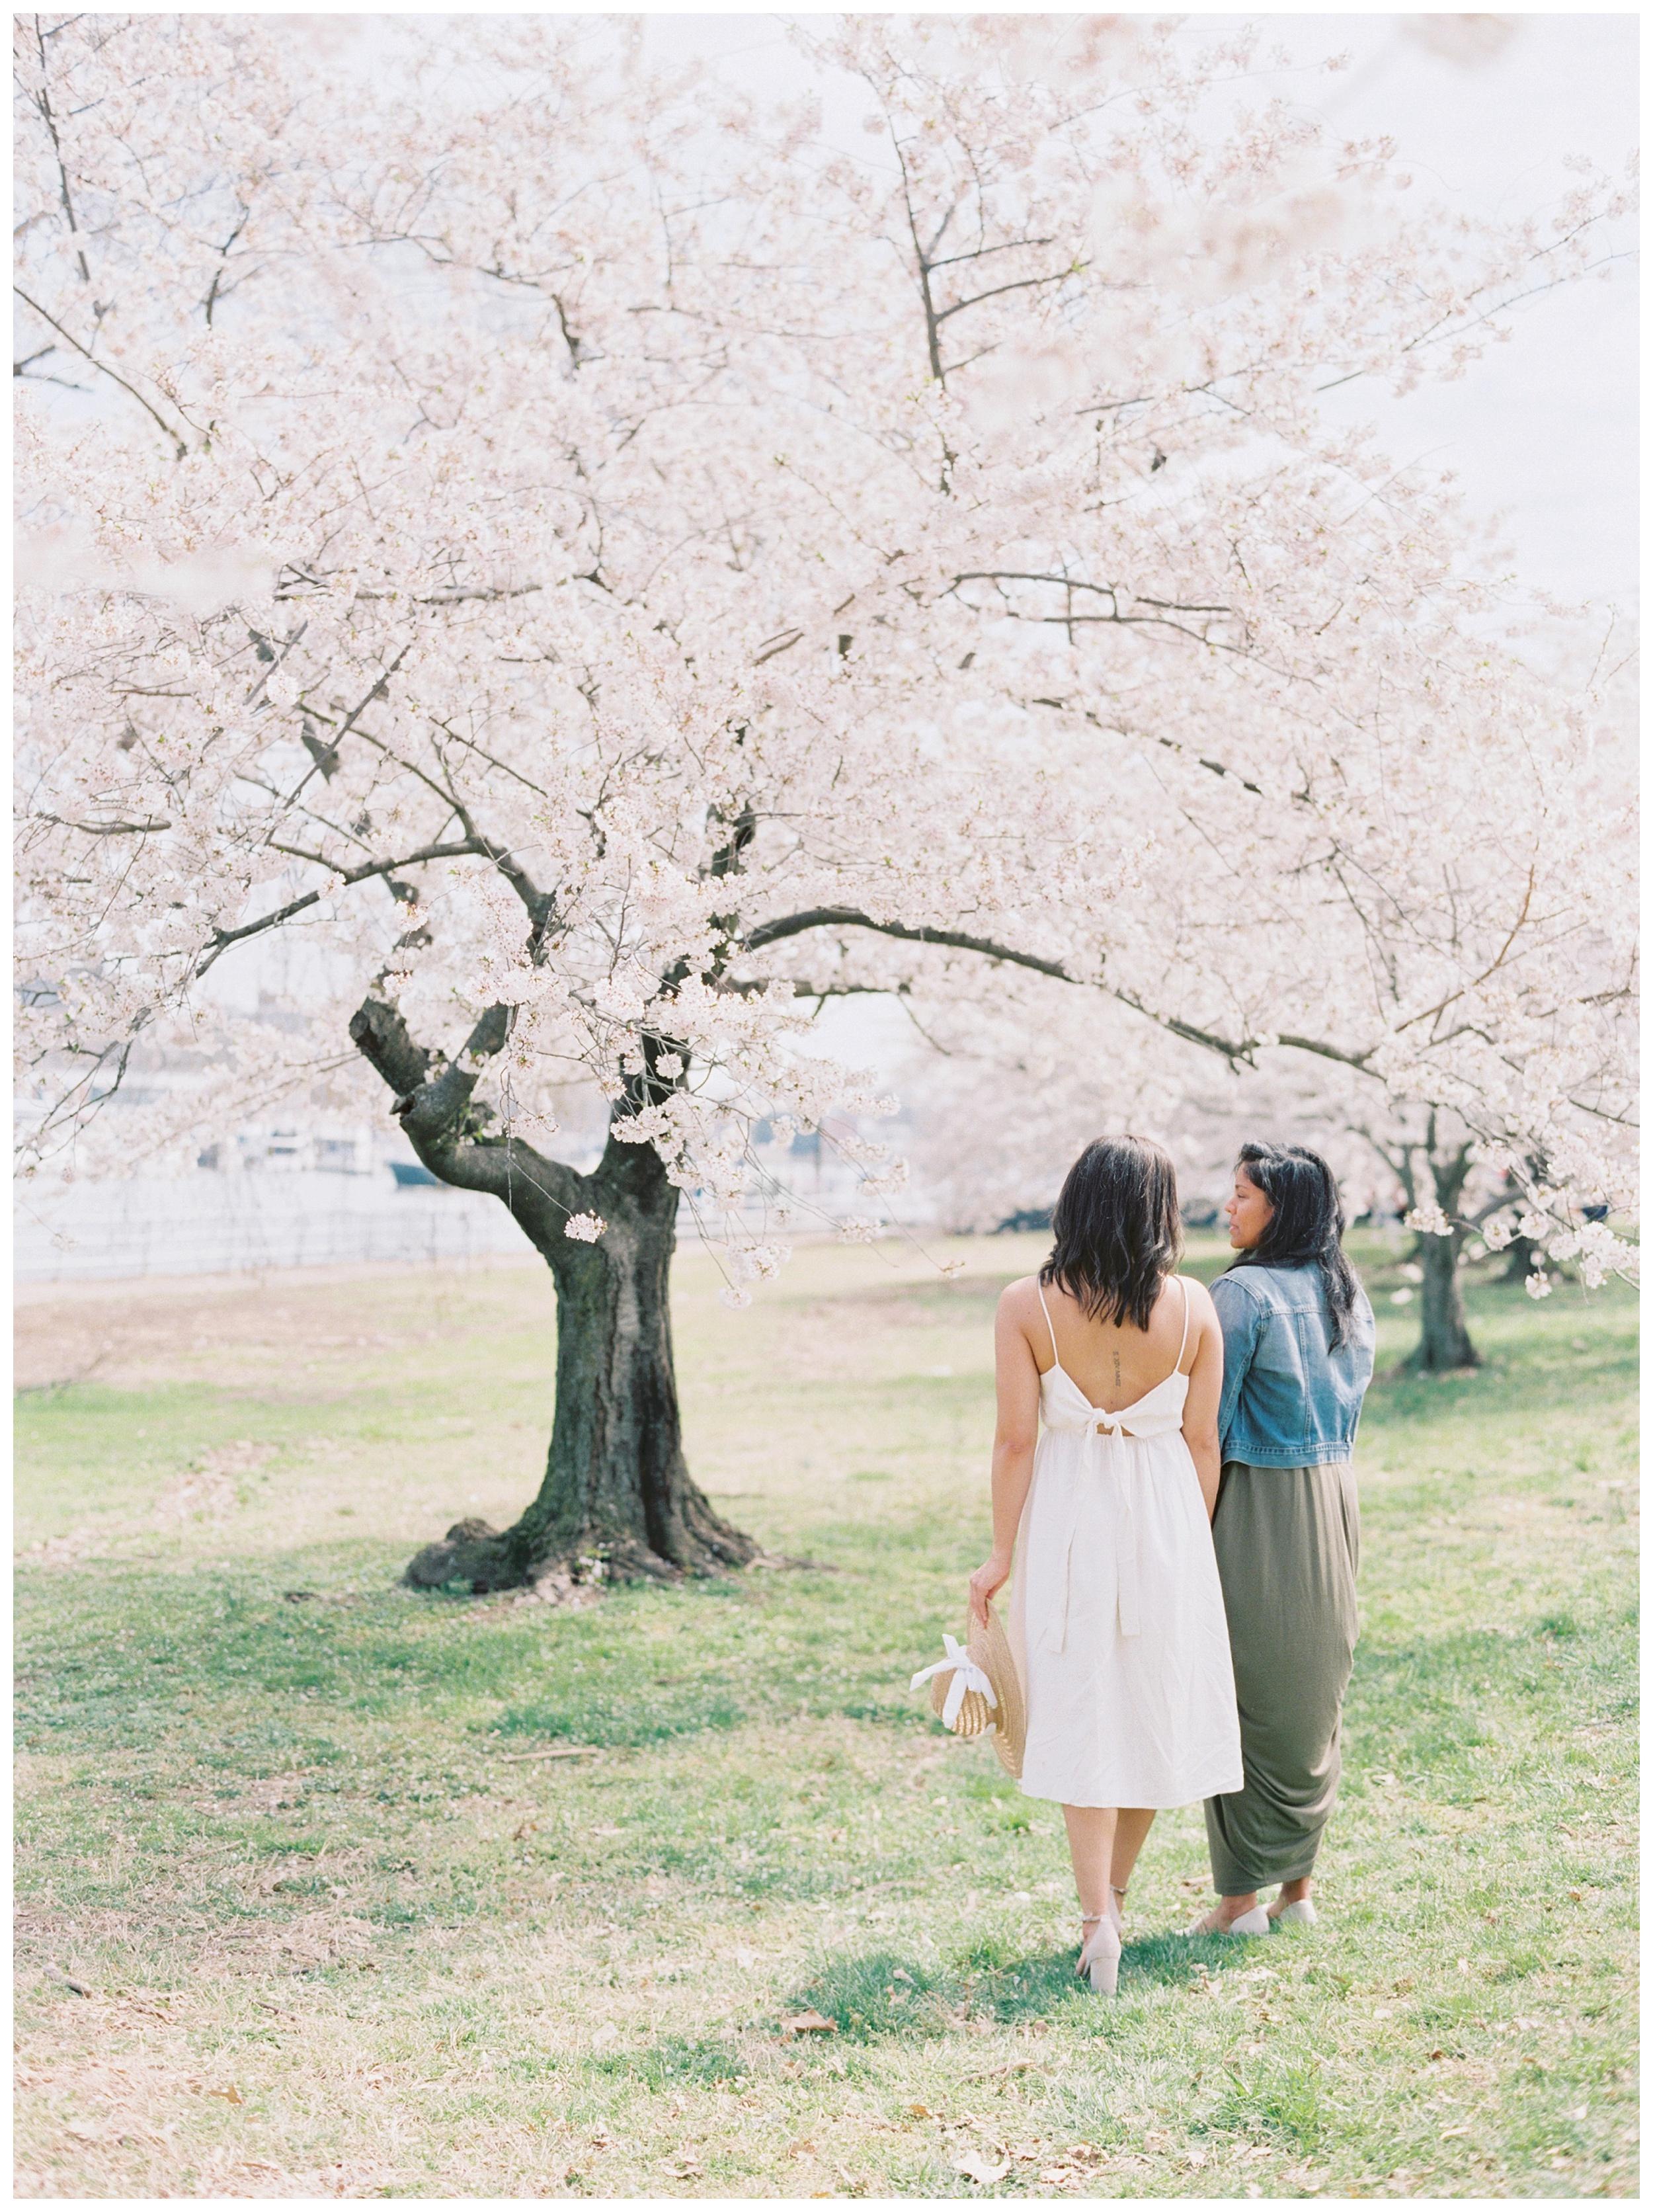 Same Sex DC Engagement | District of Columbia Cherry Blossom Engagement Kir Tuben_0018.jpg